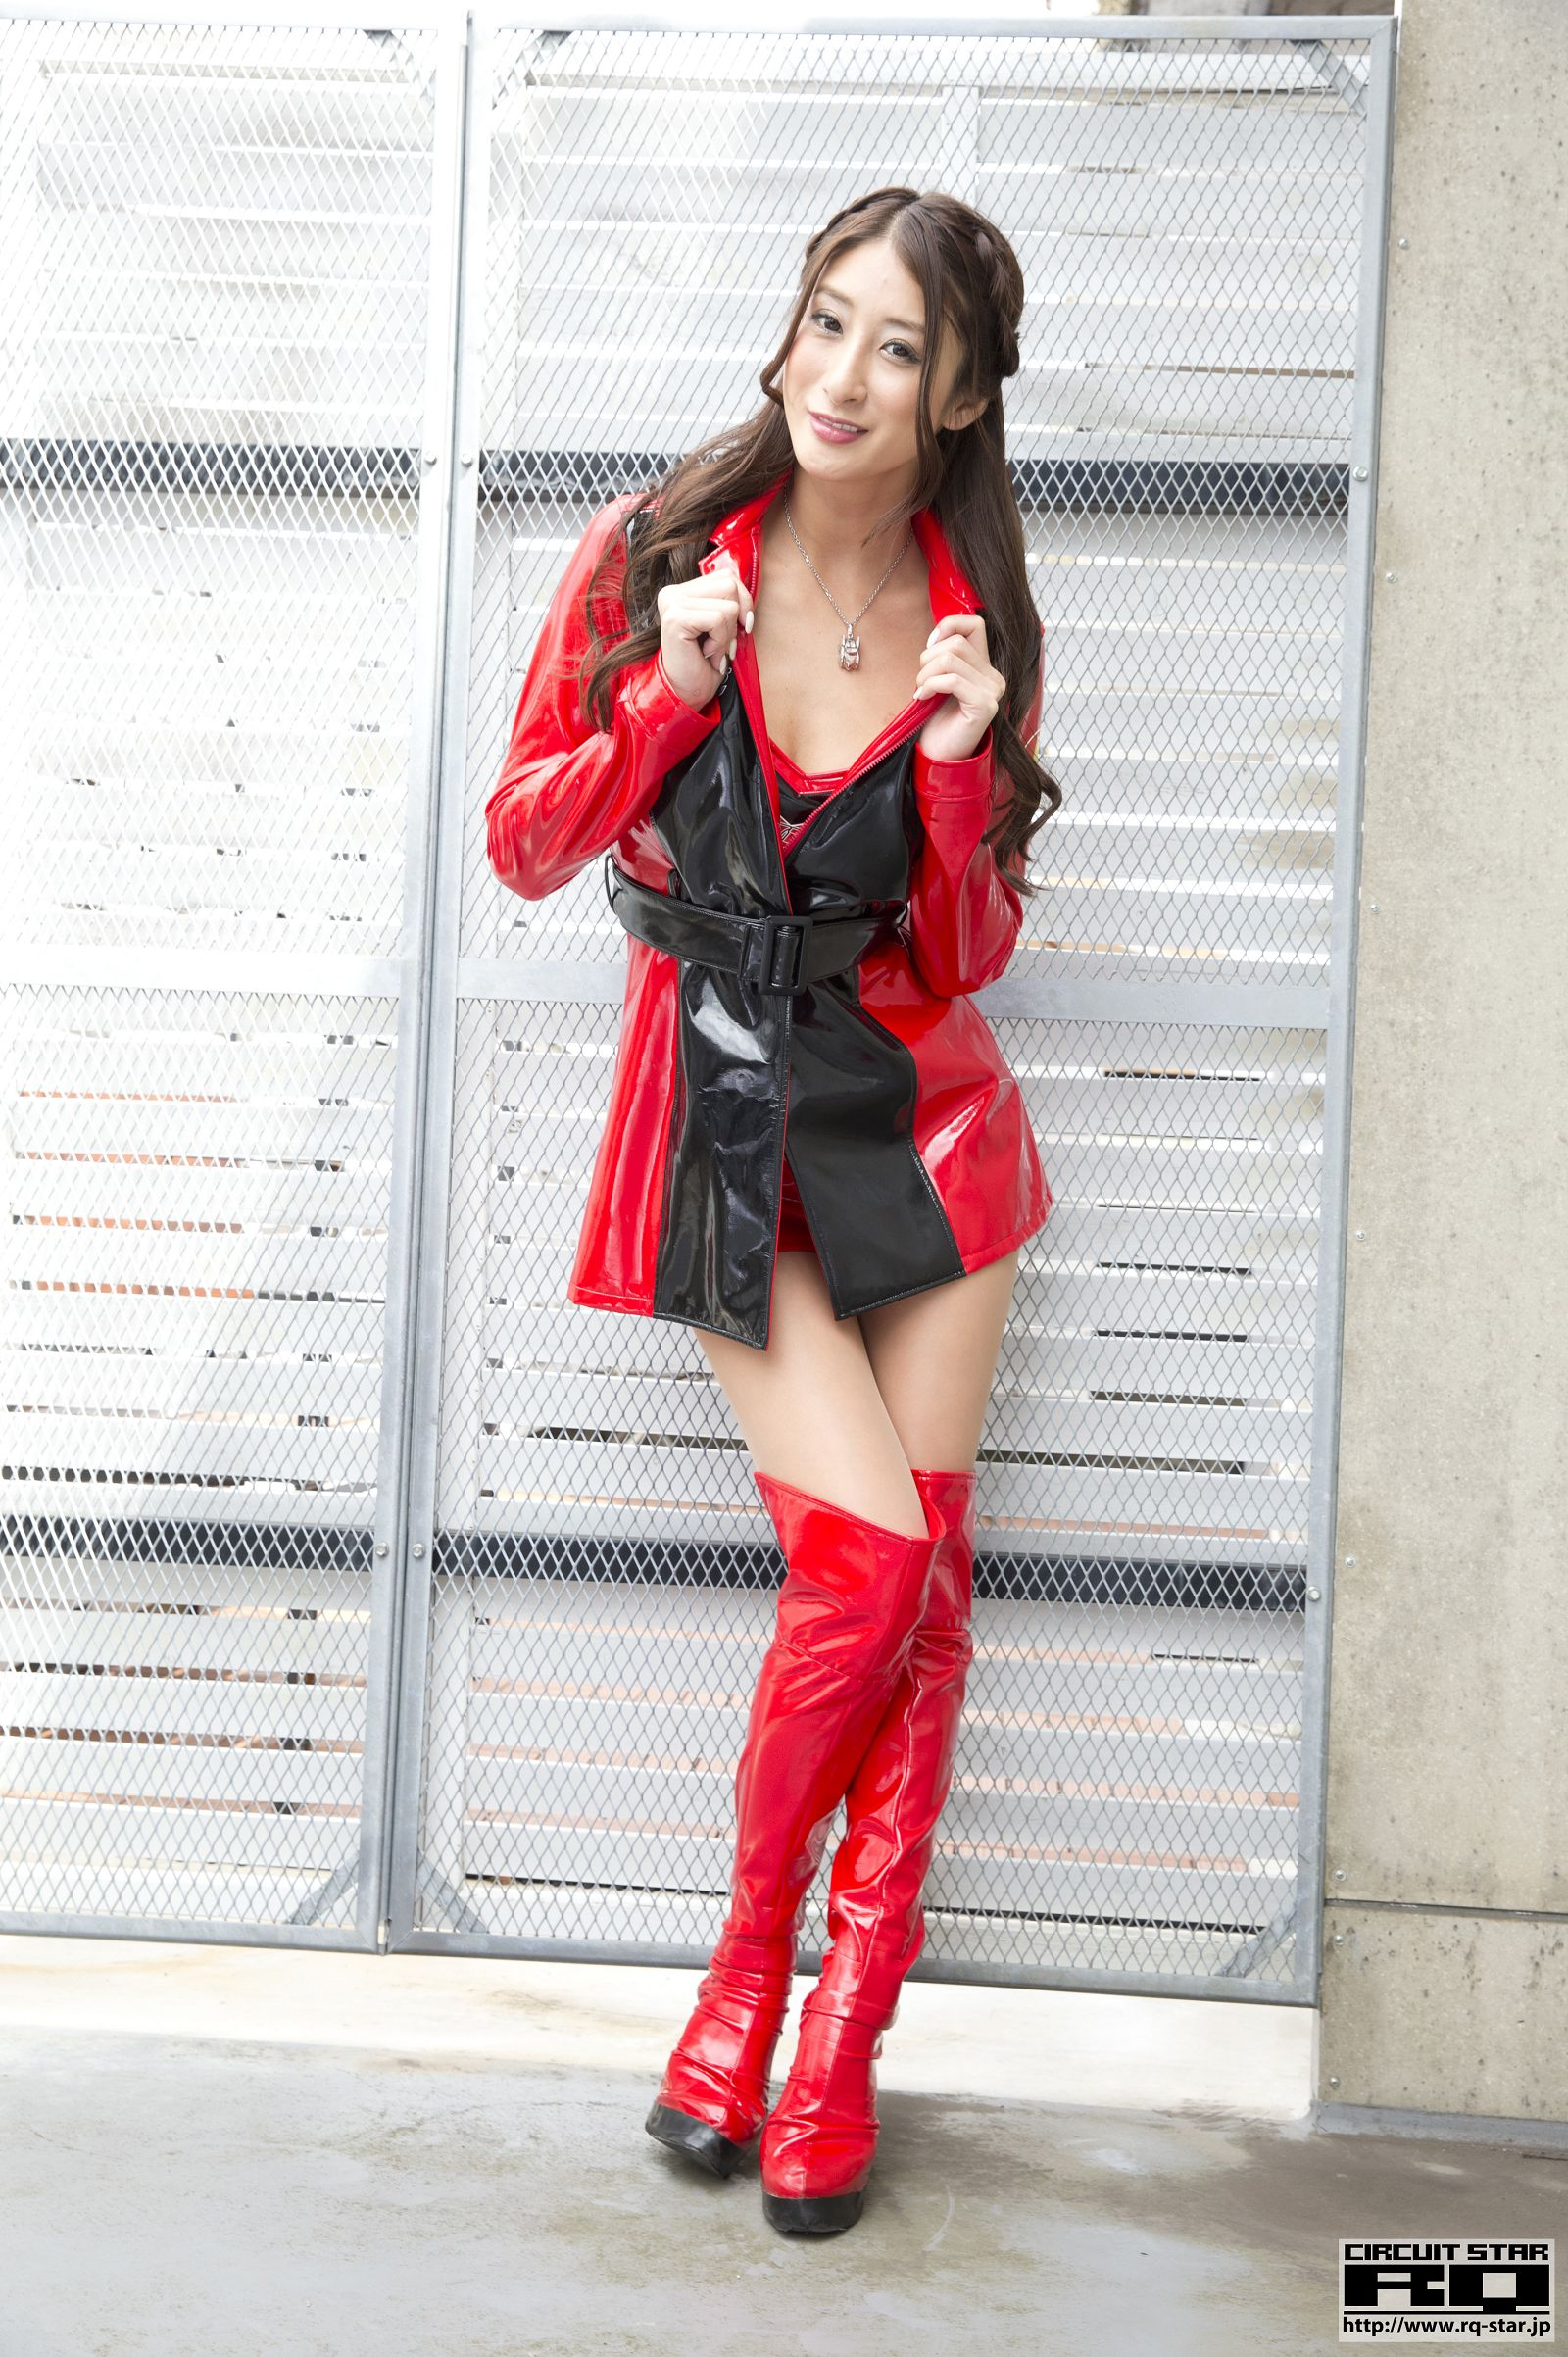 [RQ STAR美女] NO.01029 Eriko Sato 佐藤衣里子 Race Queen[70P] RQ STAR 第2张